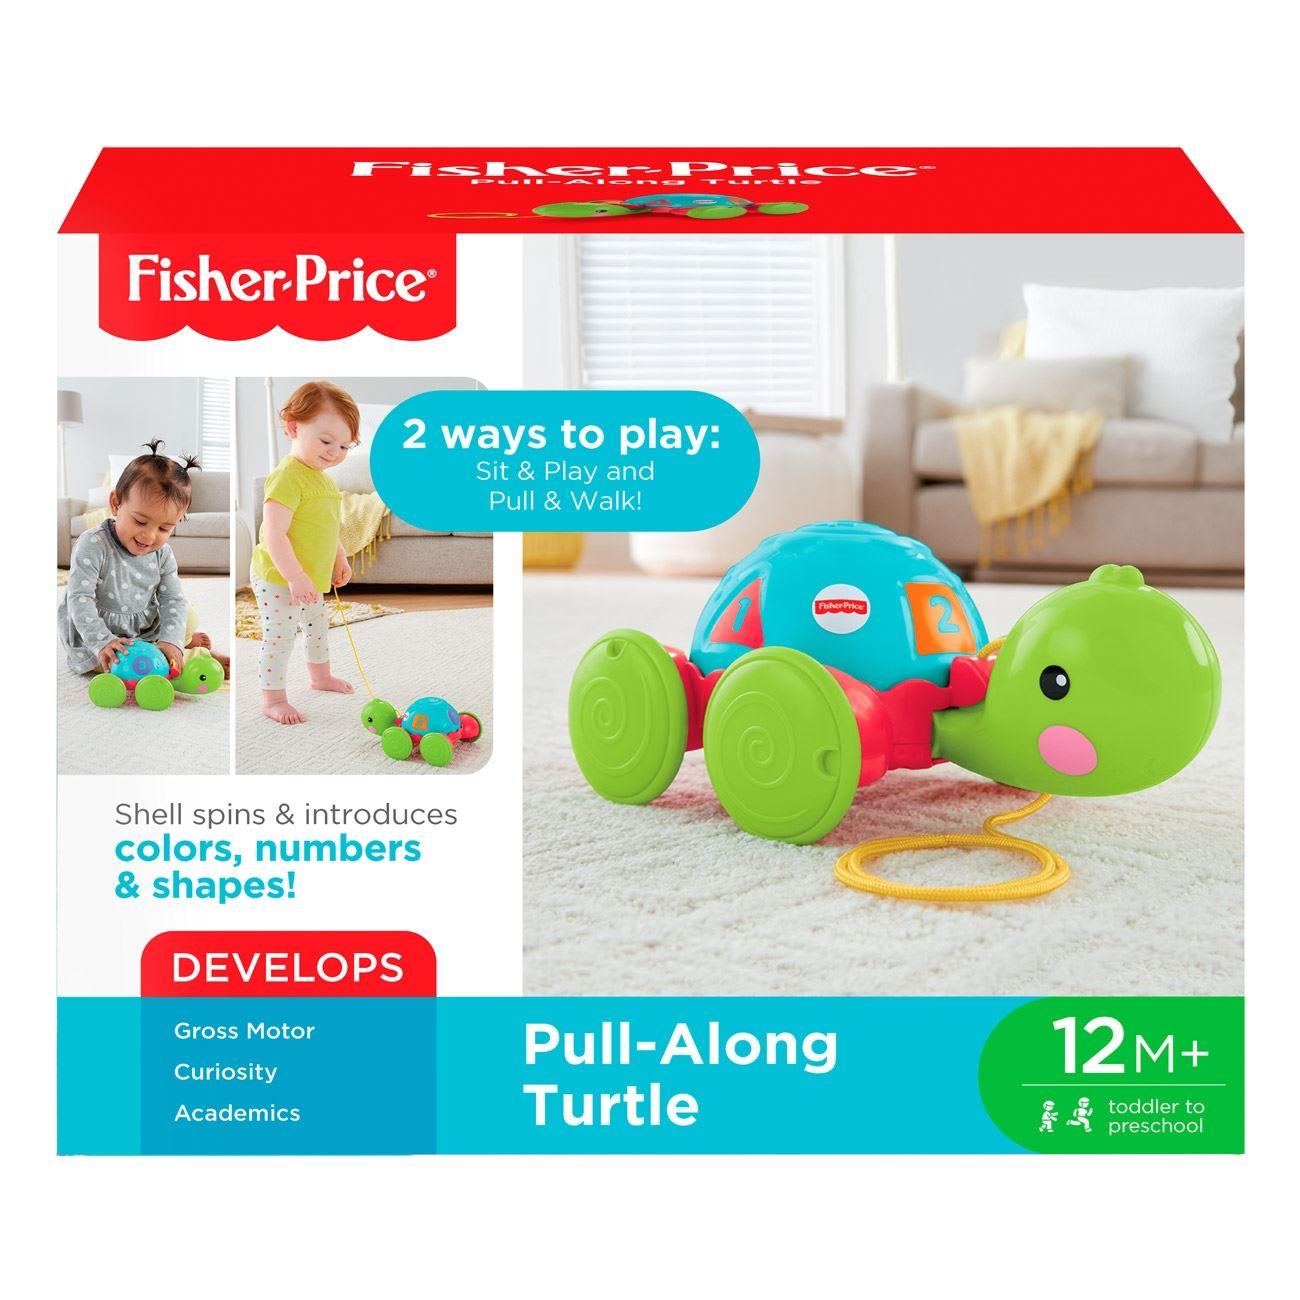 4e58f58f86 Χελωνίτσα Συρόμενη - Fisher Price   Παιχνίδια Fisher Price